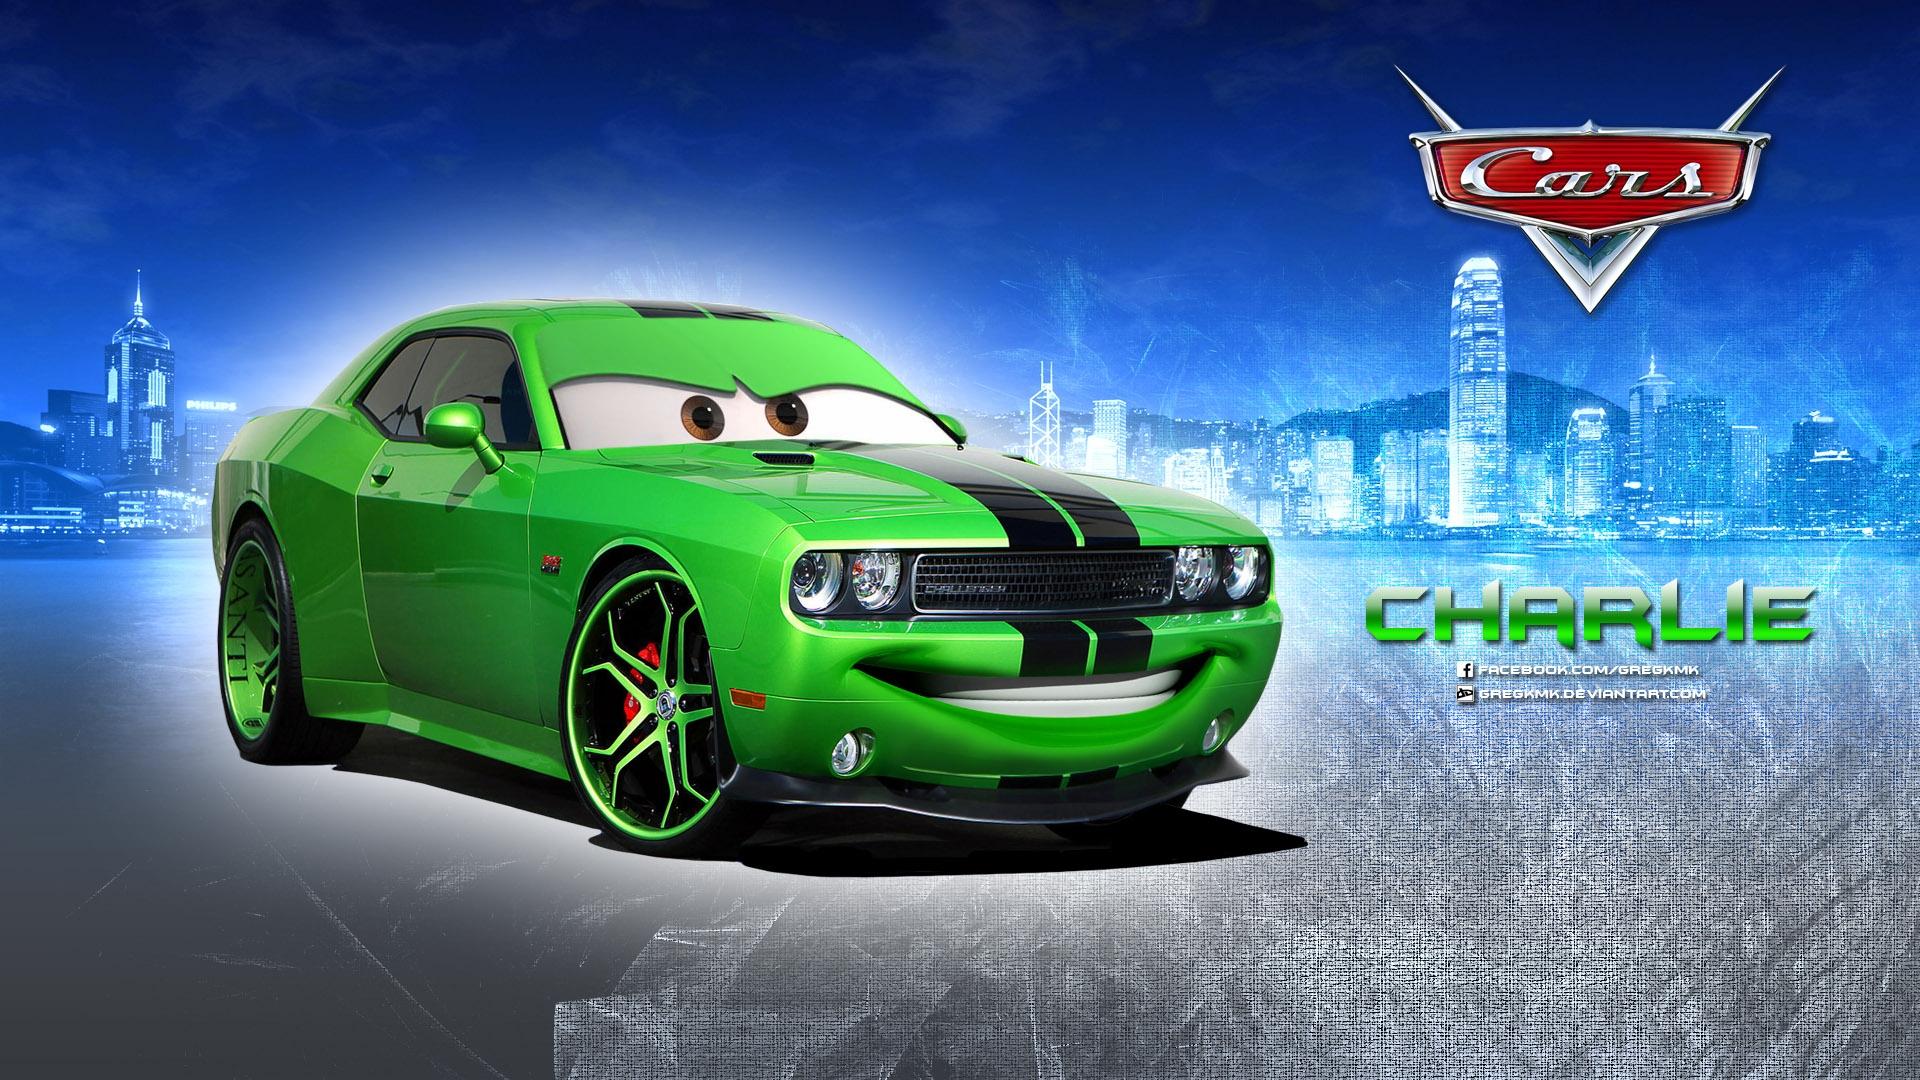 charlie dodge challenger disney pixar cars 1 2 hd wallpaper 1920x1080